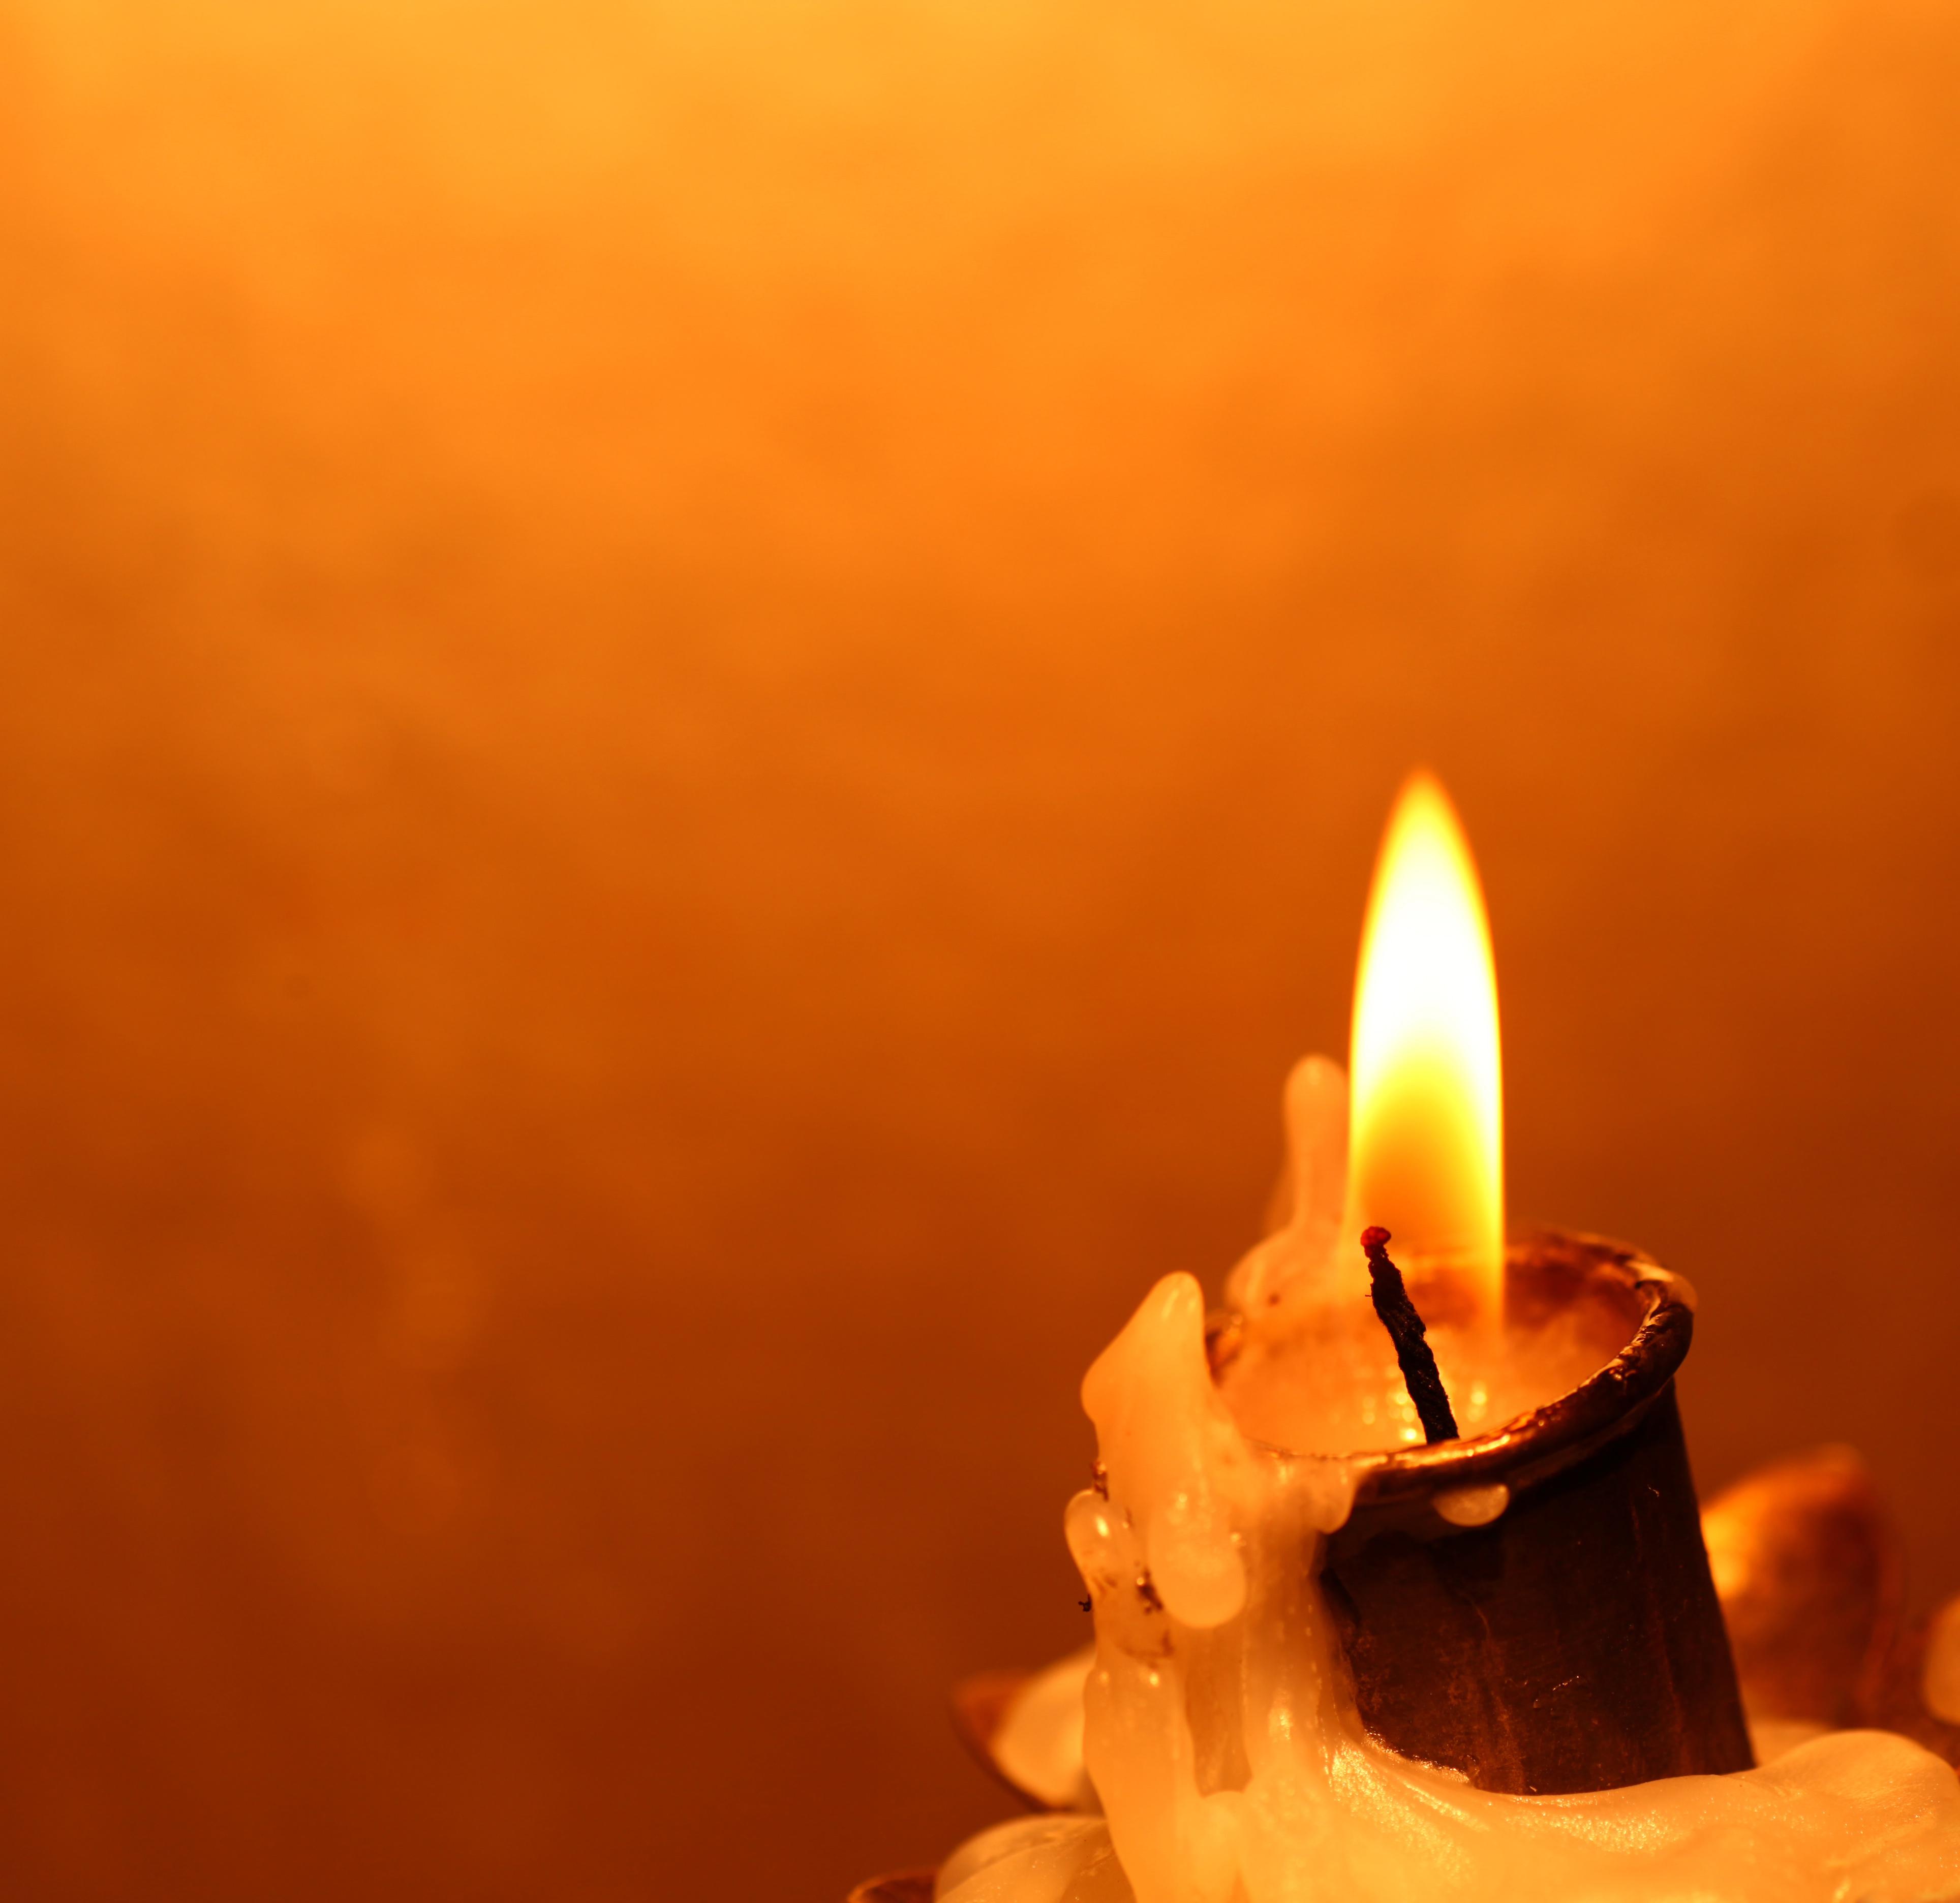 Candle, Aflame, Memory, Illumination, Lit, HQ Photo